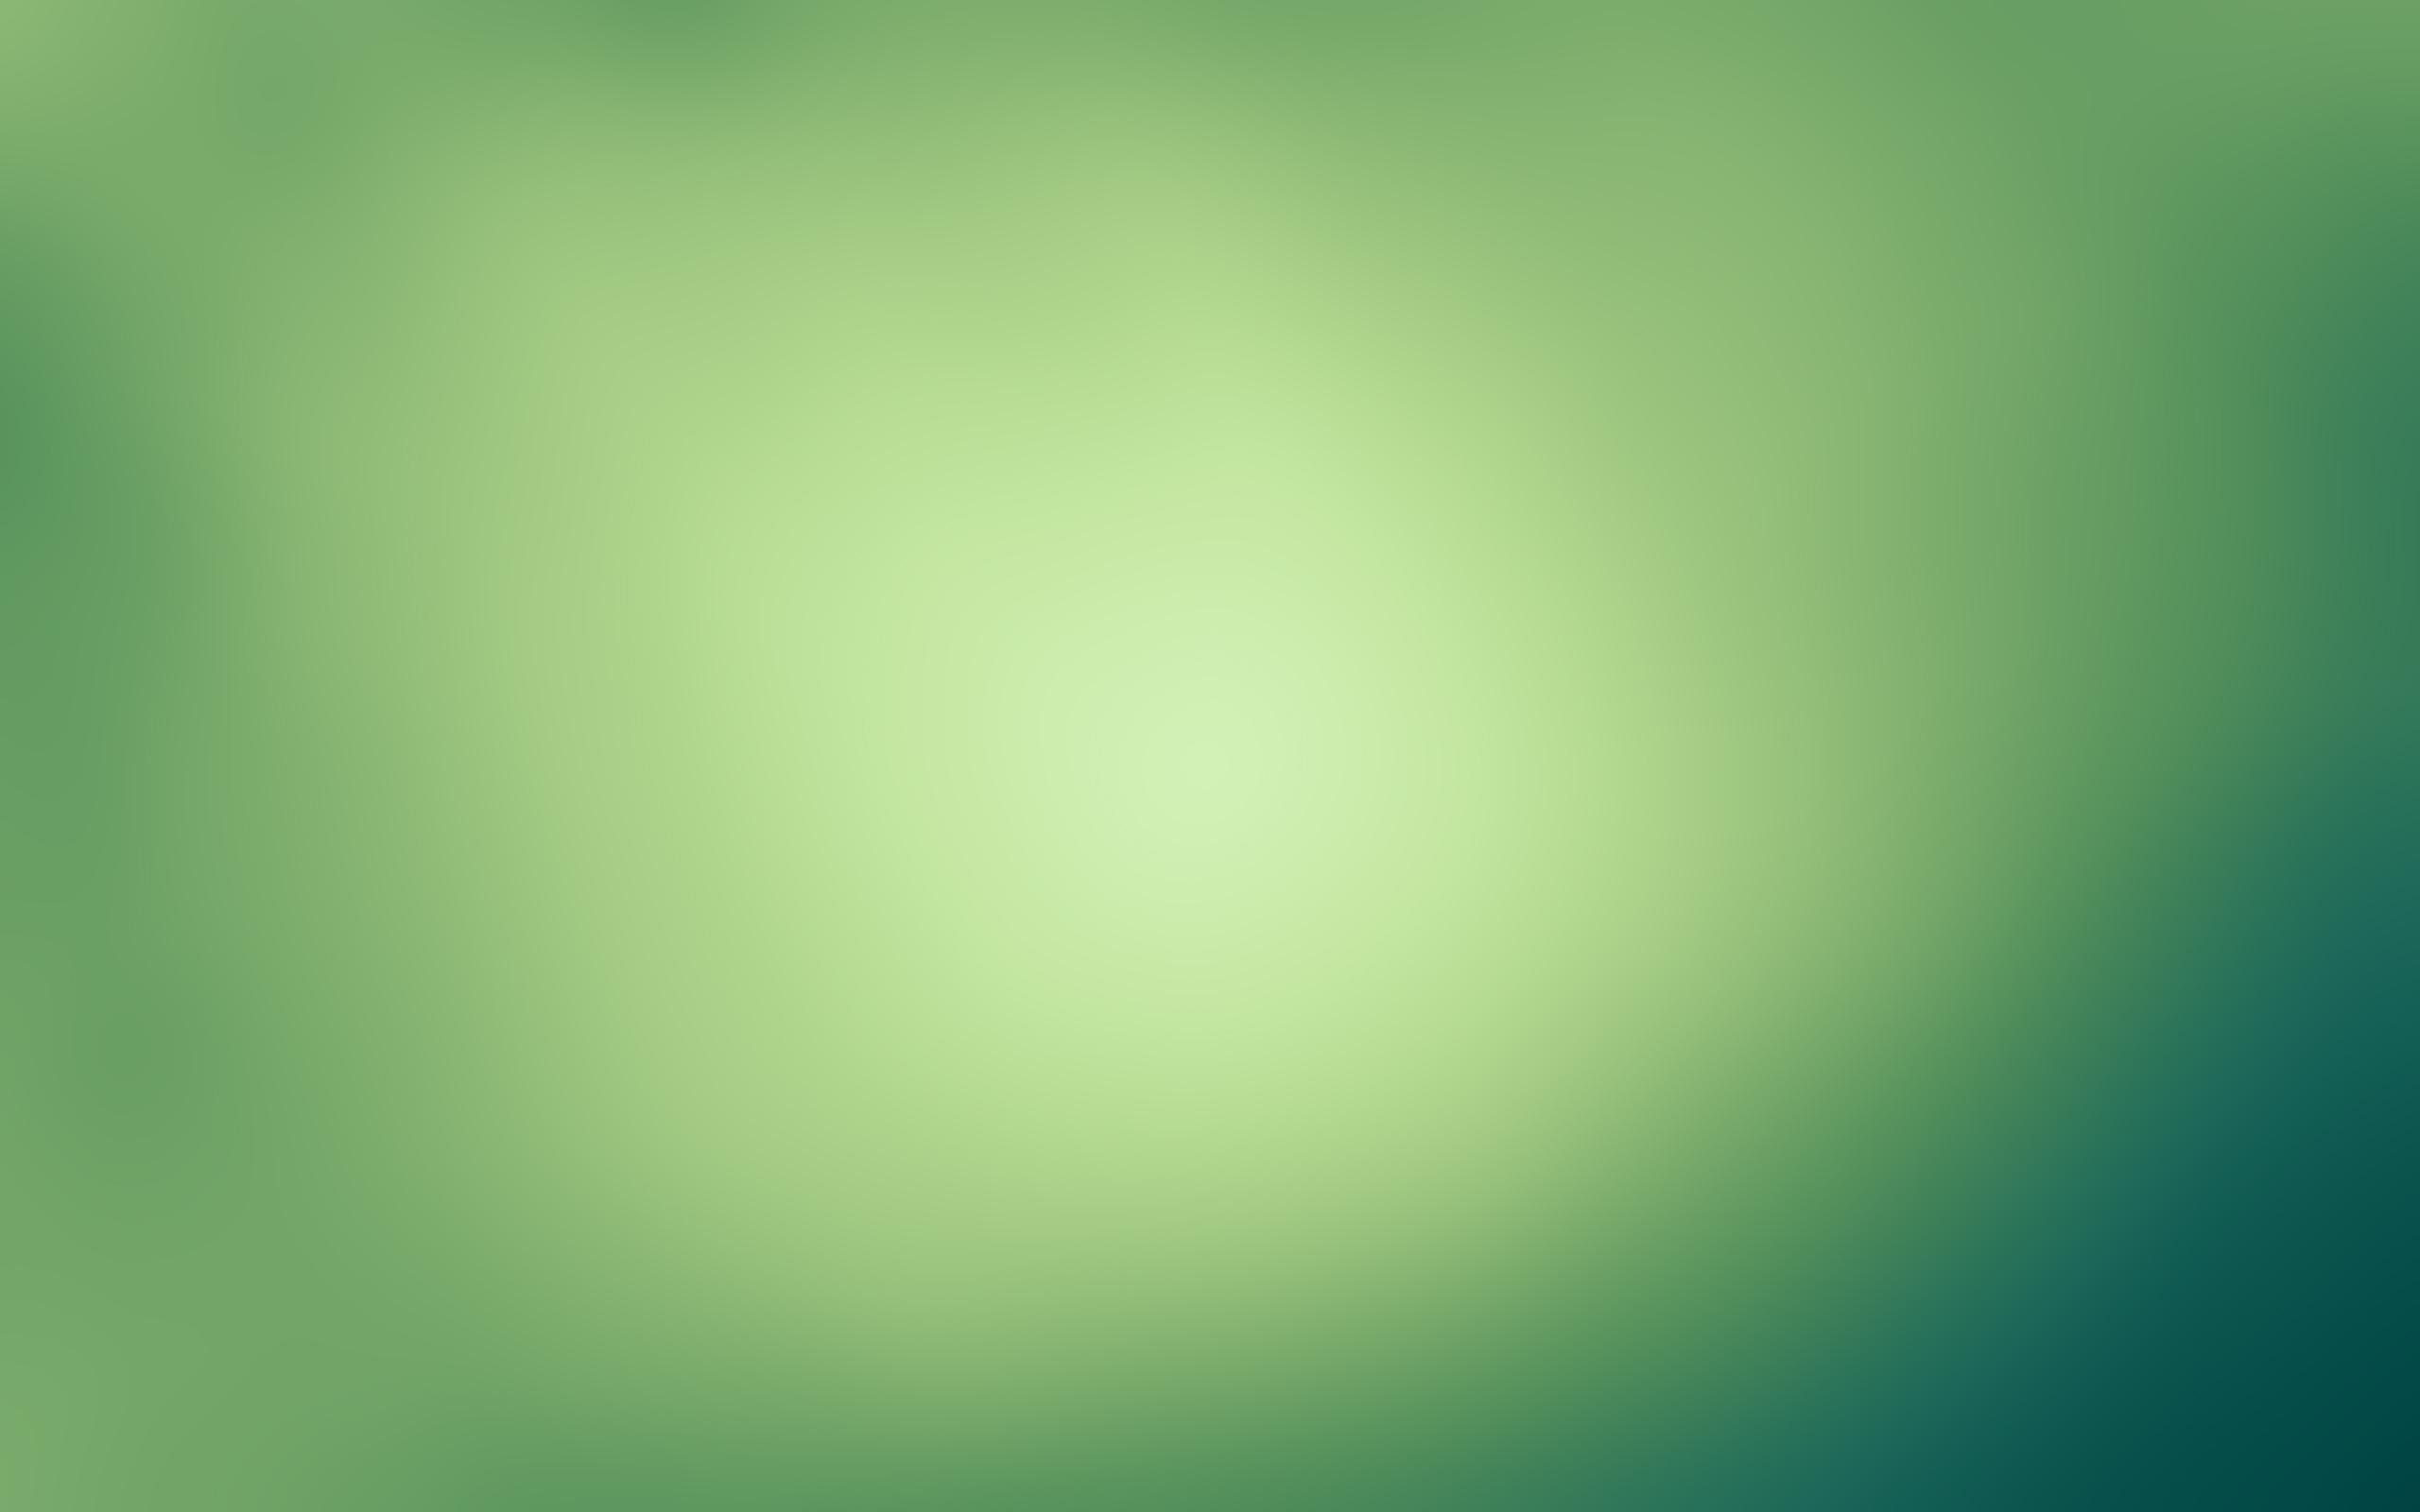 Free Download 3d Wallpaper For Android Tablet Solid Color Wallpaper Hd Pixelstalk Net